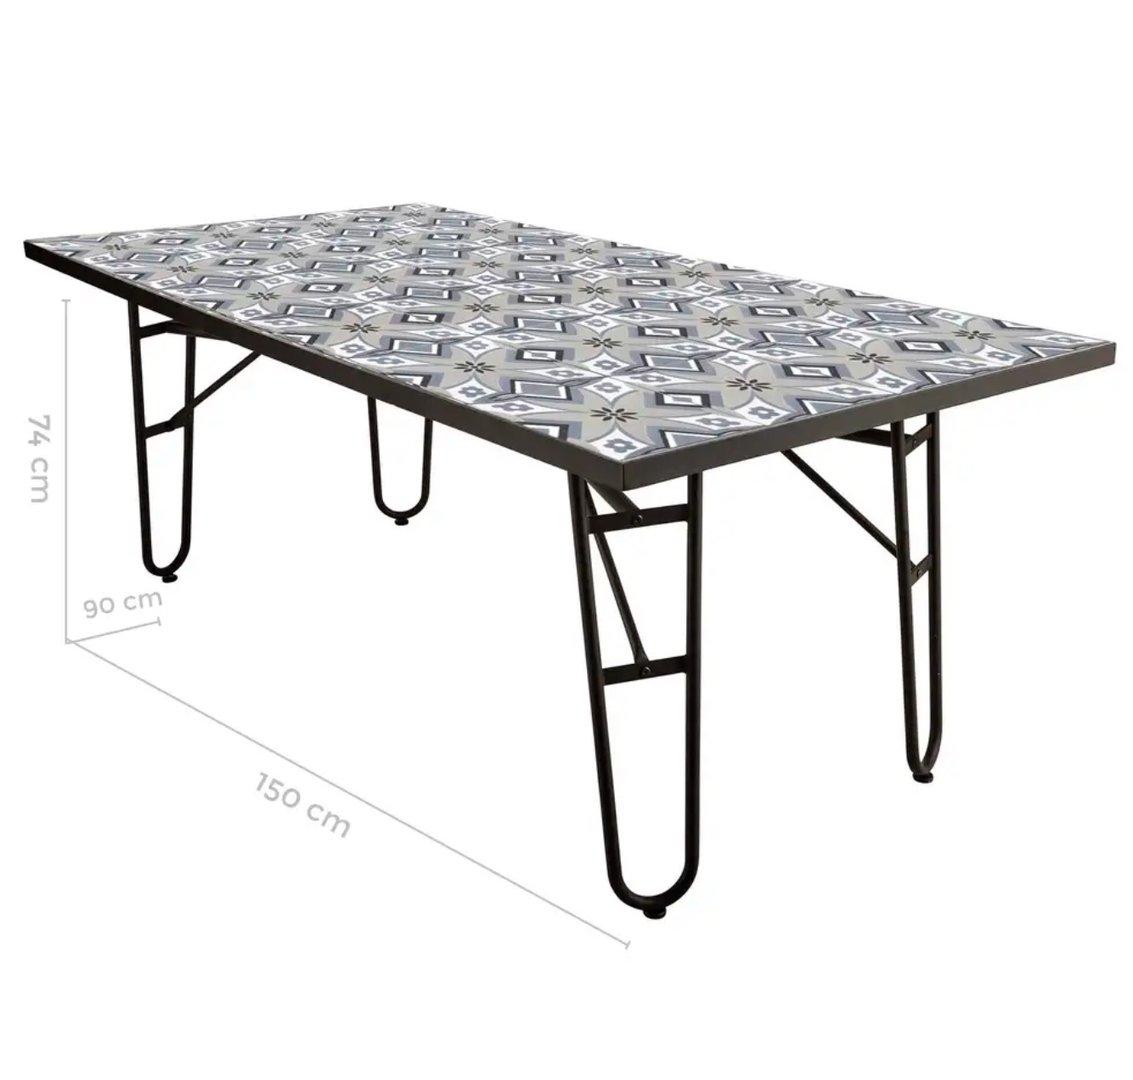 Tavoli Da Giardino Decorati.Tavolo Ferro Battuto Da Giardino Decorato Offerte Mobili Online